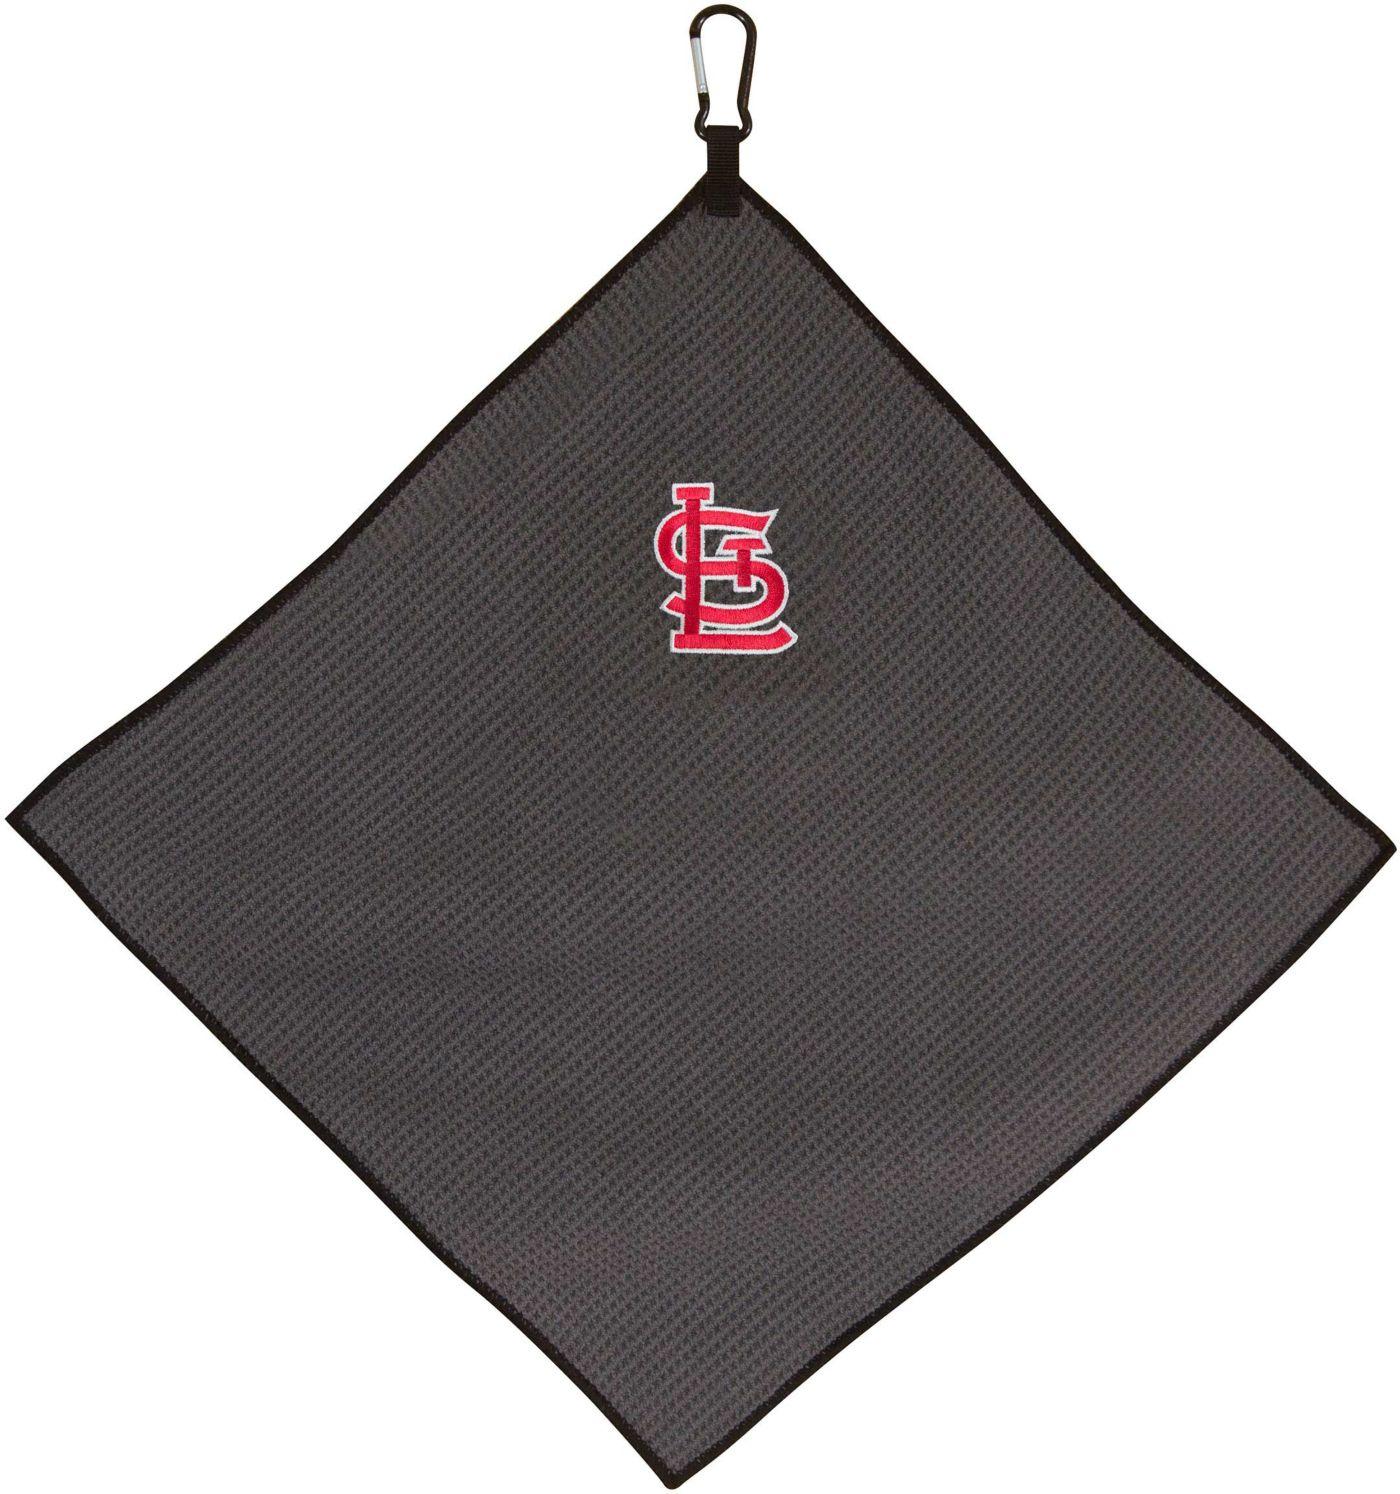 "Team Effort St. Louis Cardinals 15"" x 15"" Microfiber Golf Towel"